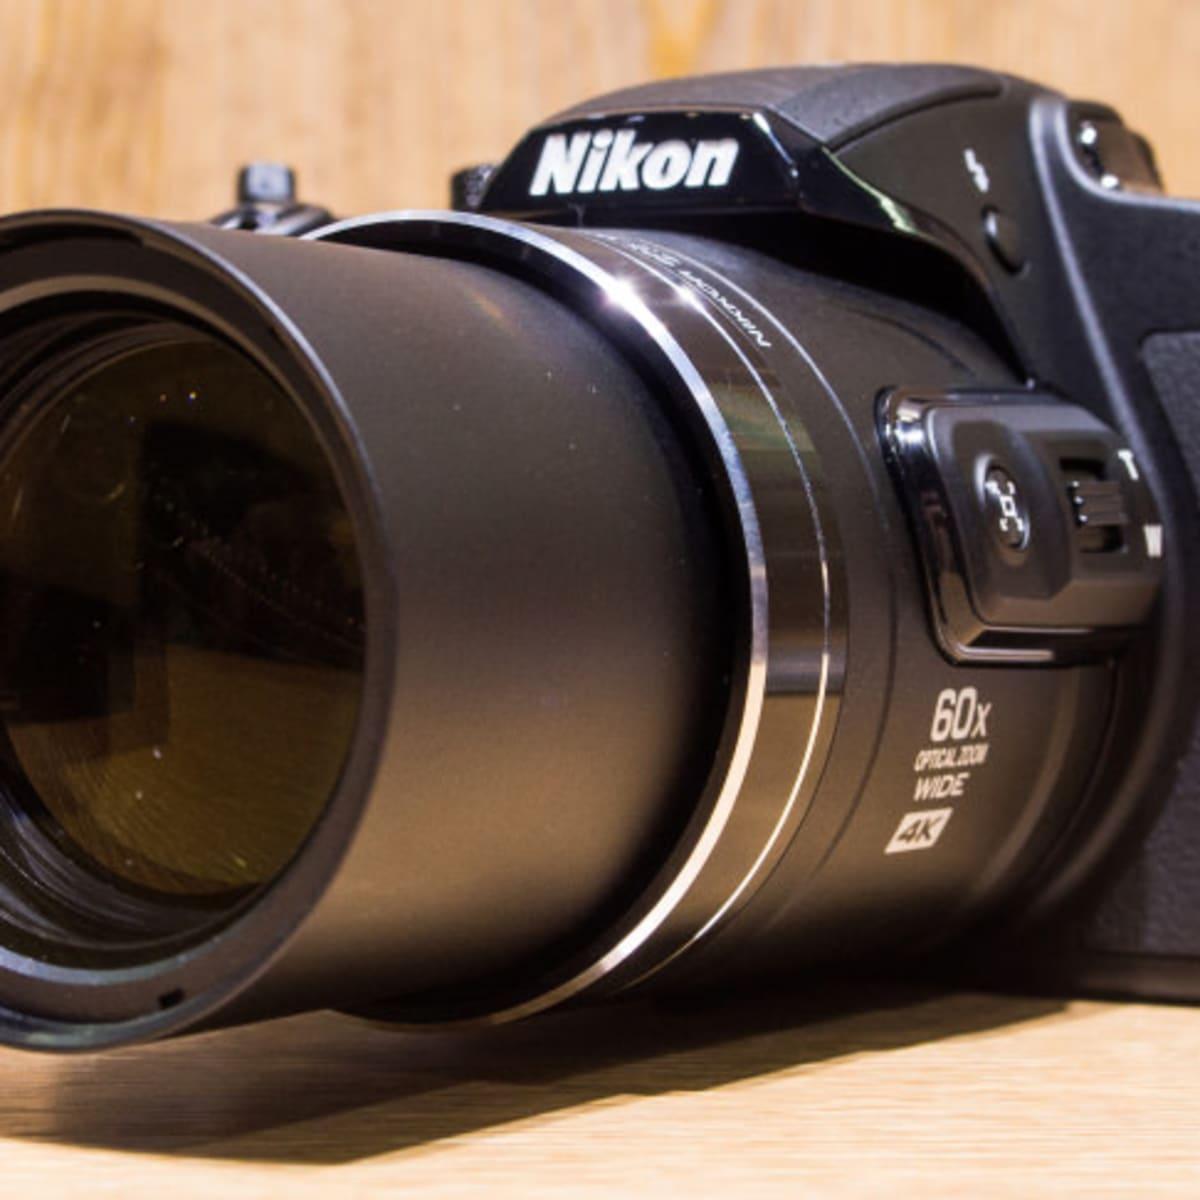 ebde5fe8f4 The Best 50x Superzoom Digital Cameras of 2019 - Reviewed Cameras